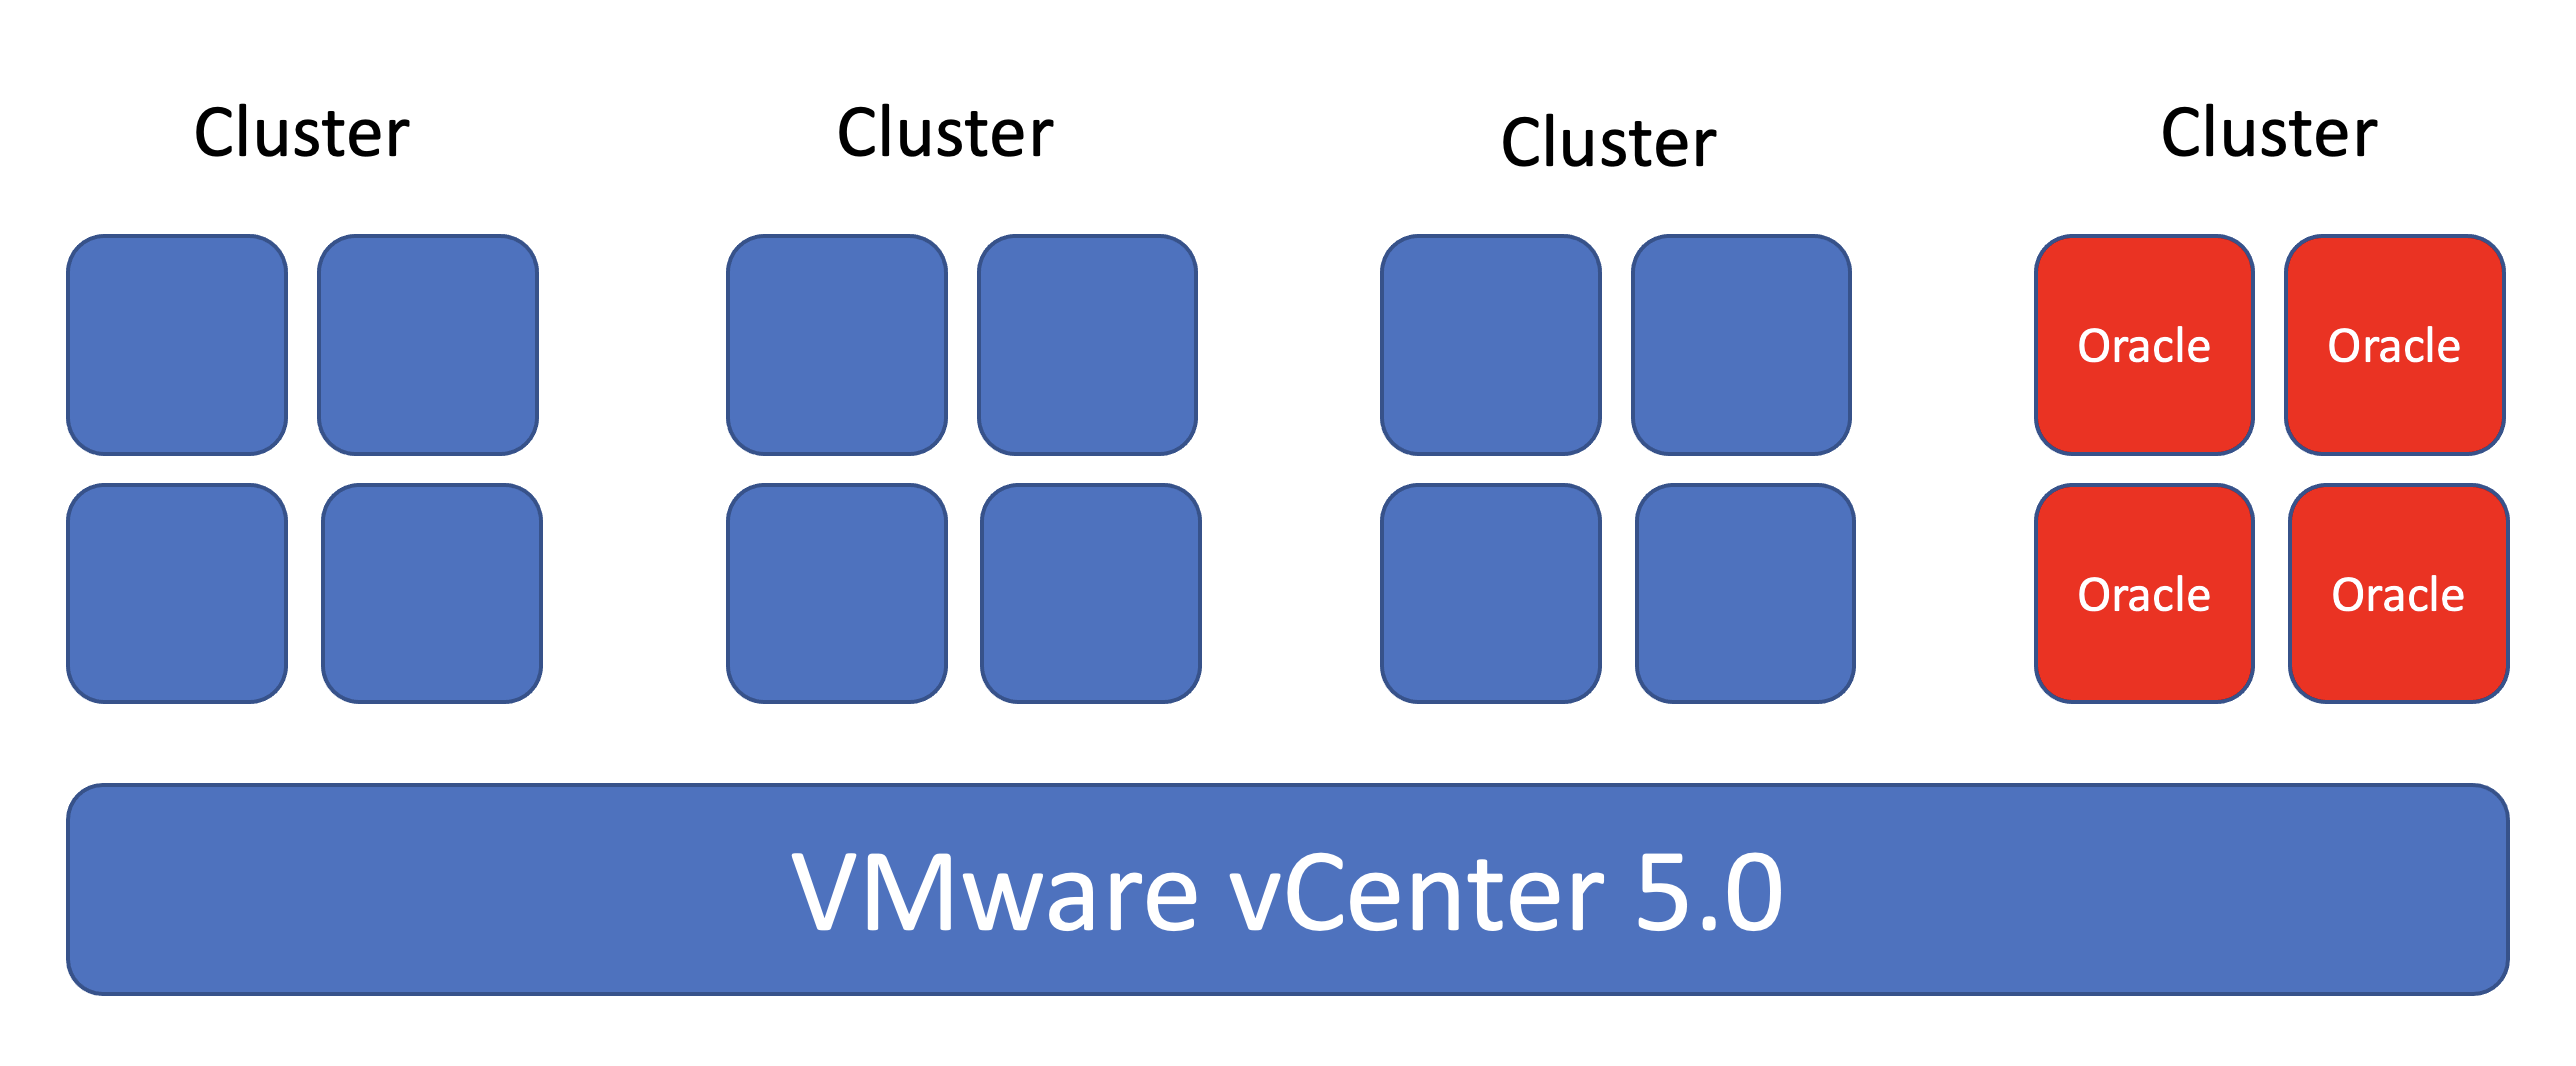 VMware vSphere up to 5.0